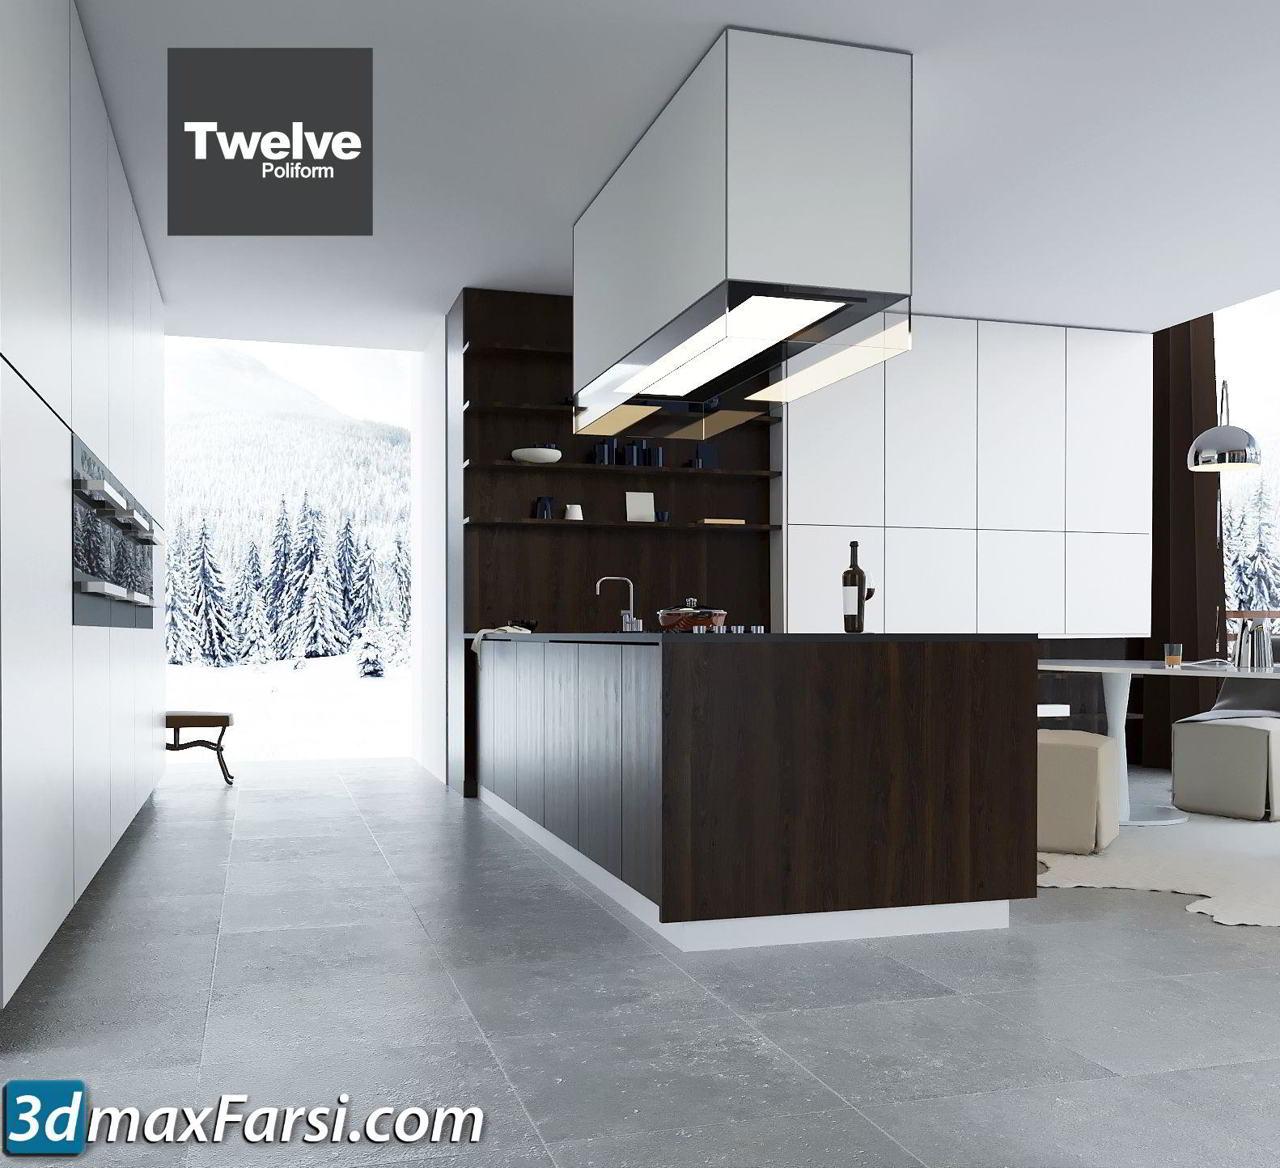 Kitchen Poliform Varenna Twelve vray corona 3ds max